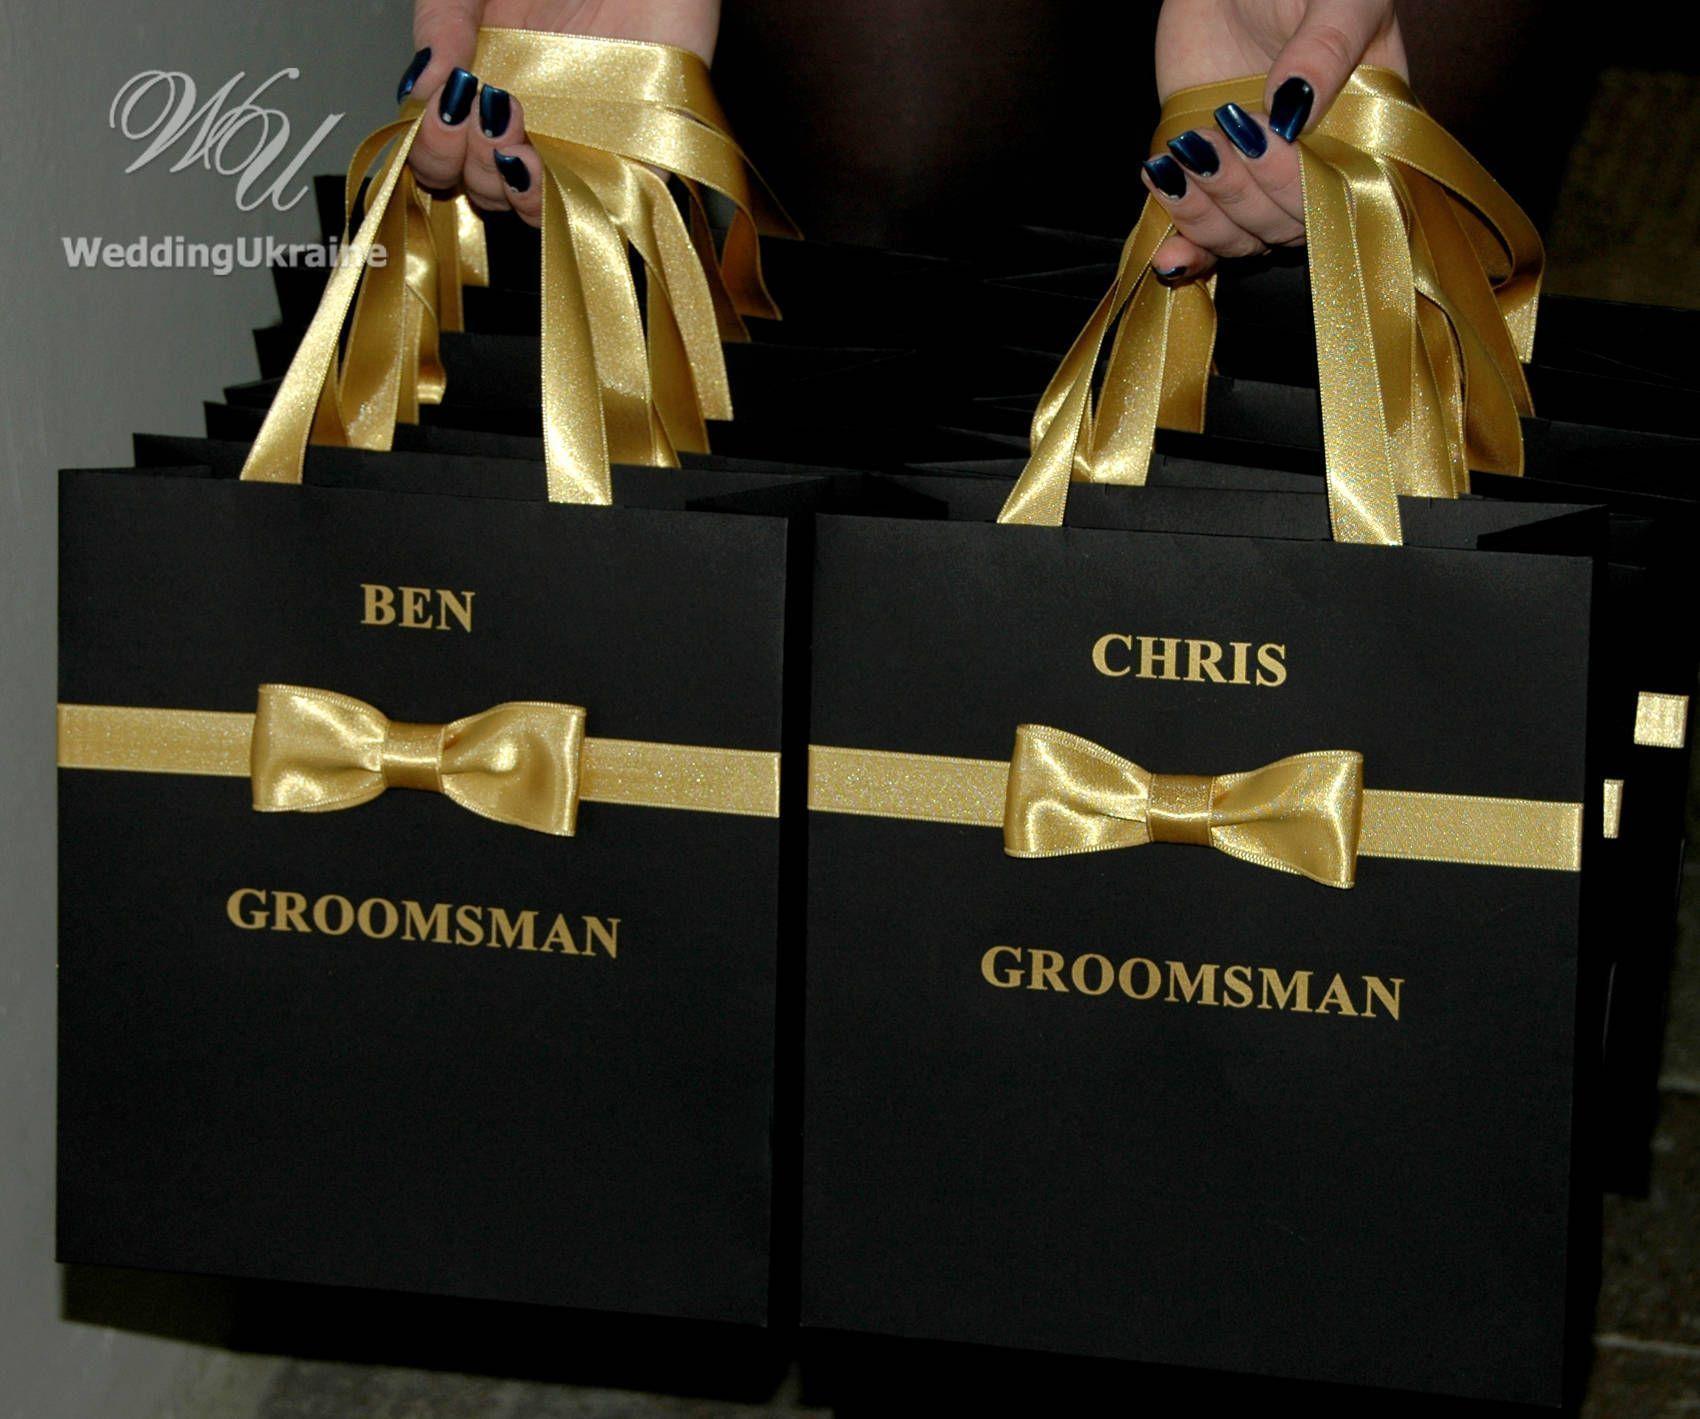 Wedding Flowers Groomsman Ideas Cheap Groomsman Gift Ideas Cheap Groomsman Gift Boxes In 2020 Groomsmen Gift Bags Groomsman Gifts Groomsmen Gifts Personalized